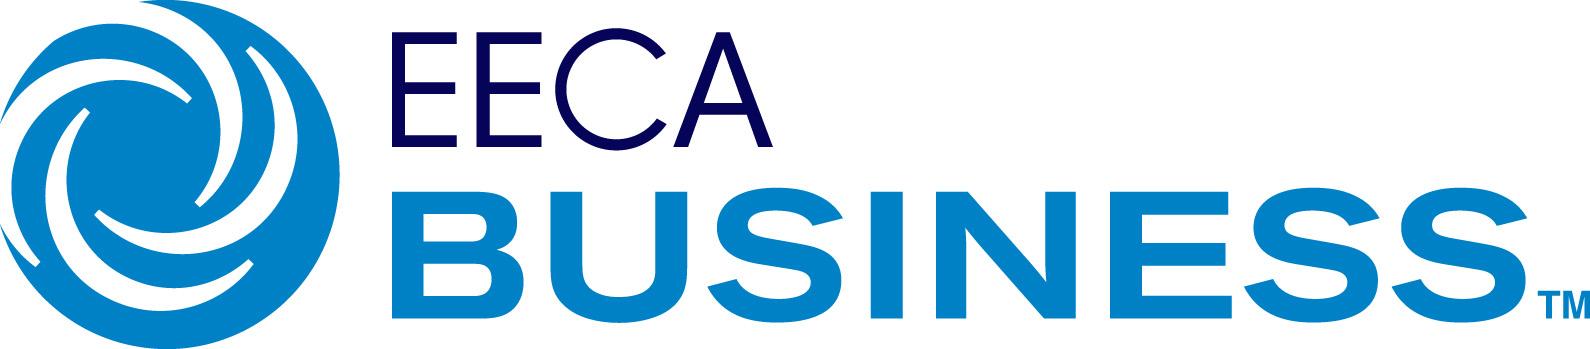 EECA Business Logo